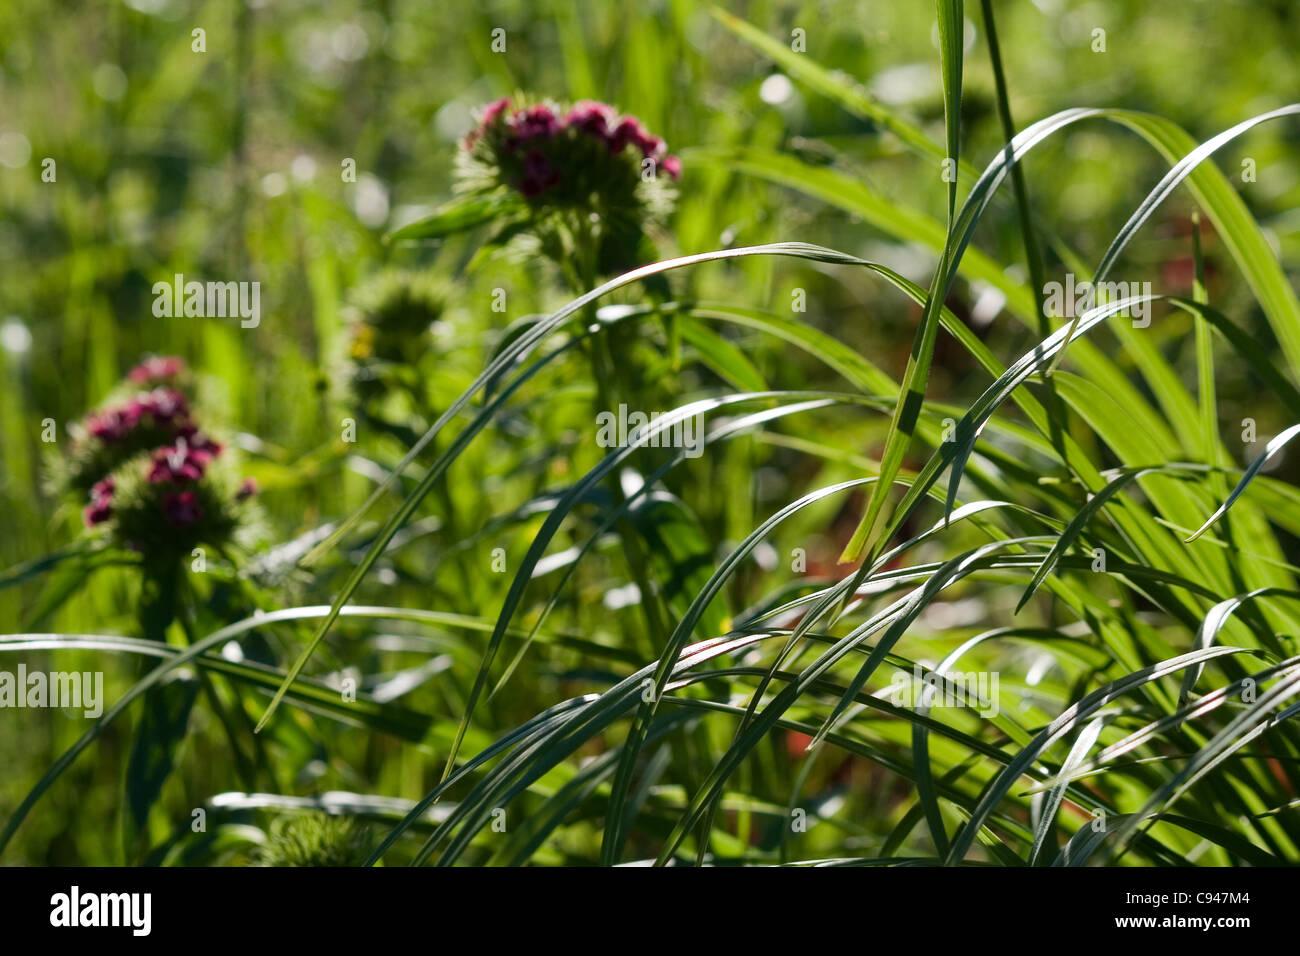 Sweet William (Dianthus barbatus) flowers in the grass - Stock Image